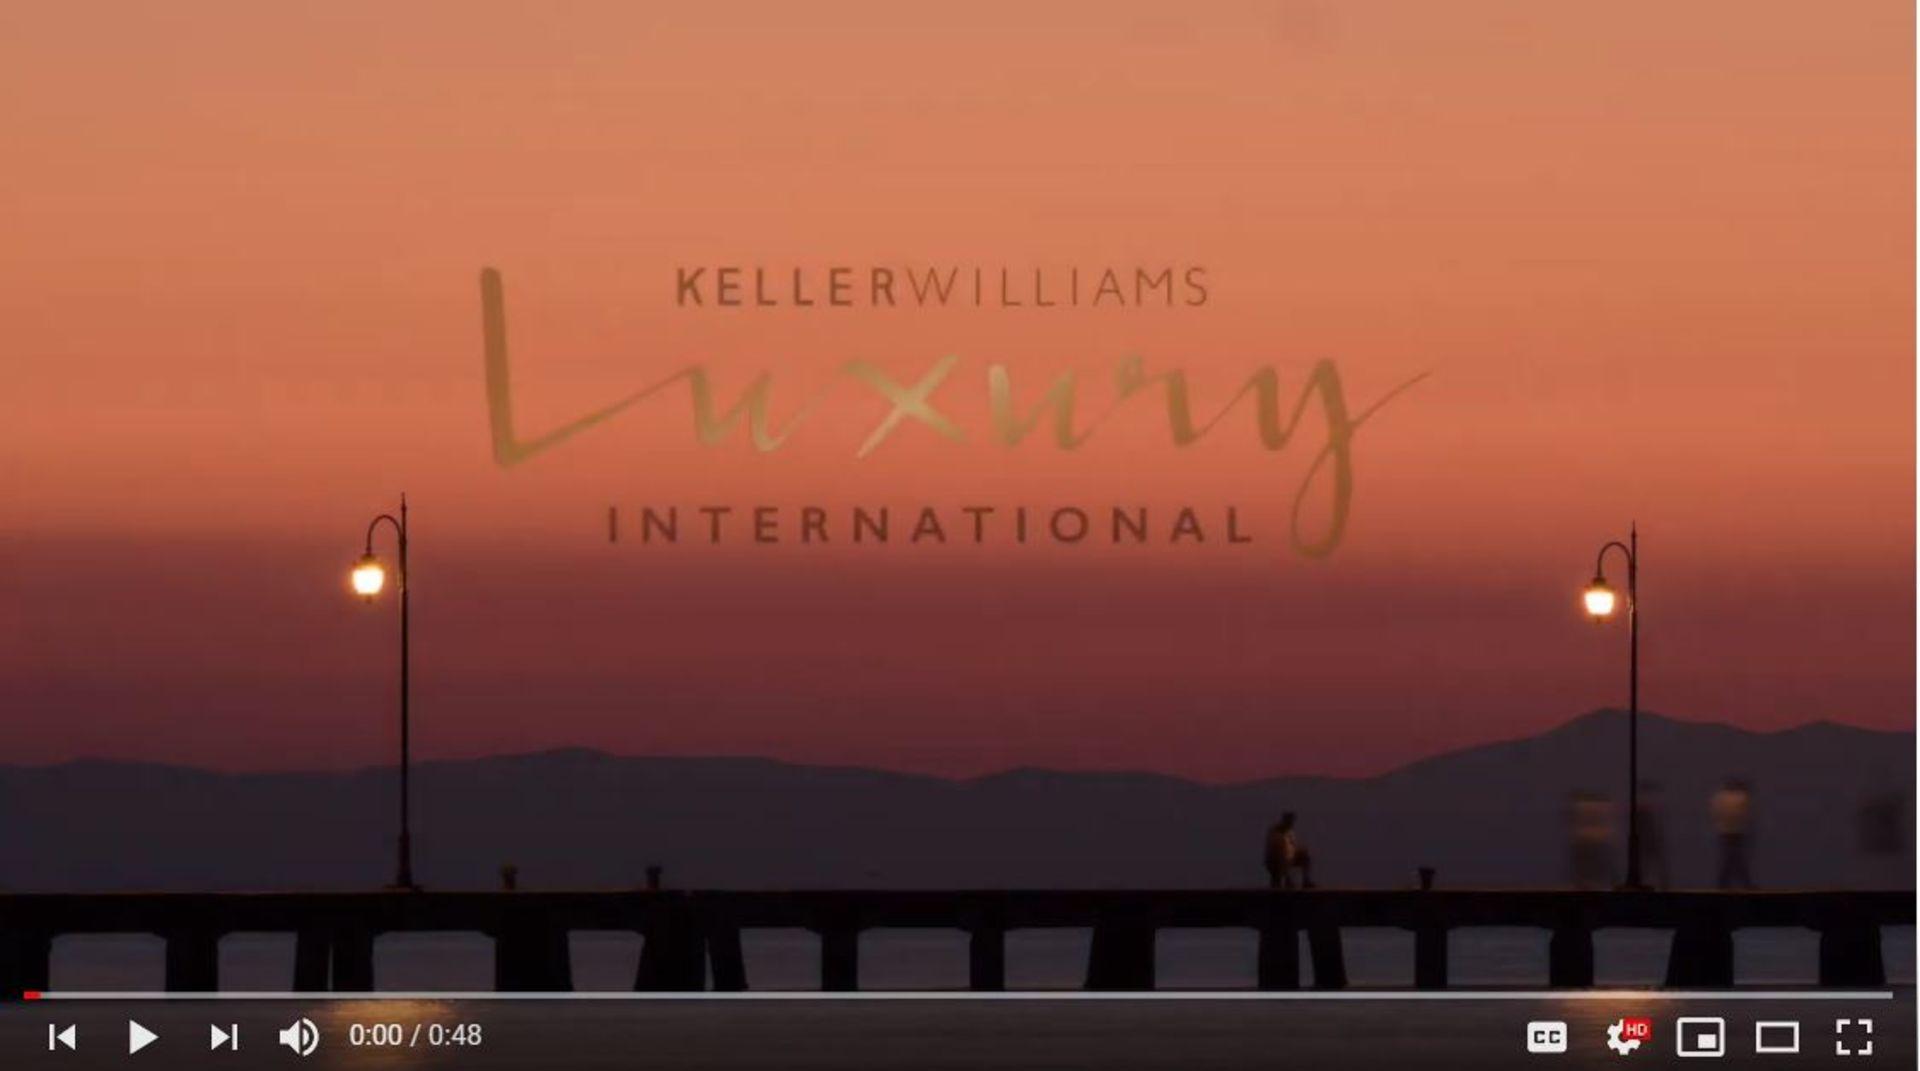 Garbell Group – Keller Williams Luxury International Real Estate